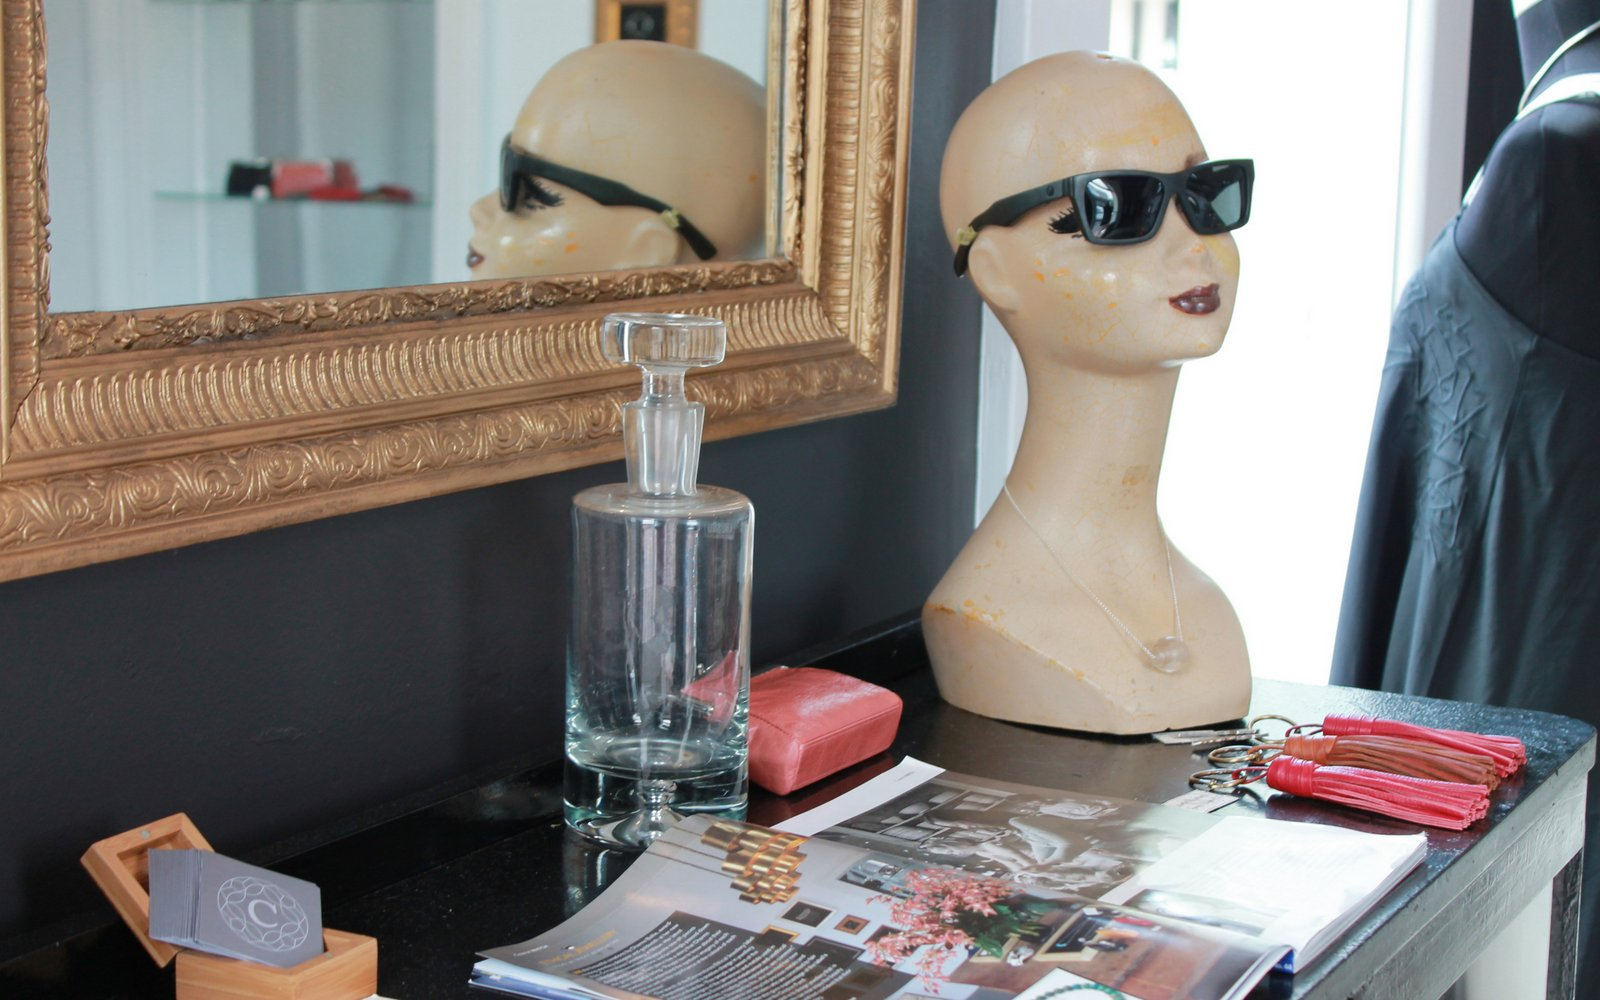 eat read love cornerstones jewellery milton nsw. Black Bedroom Furniture Sets. Home Design Ideas